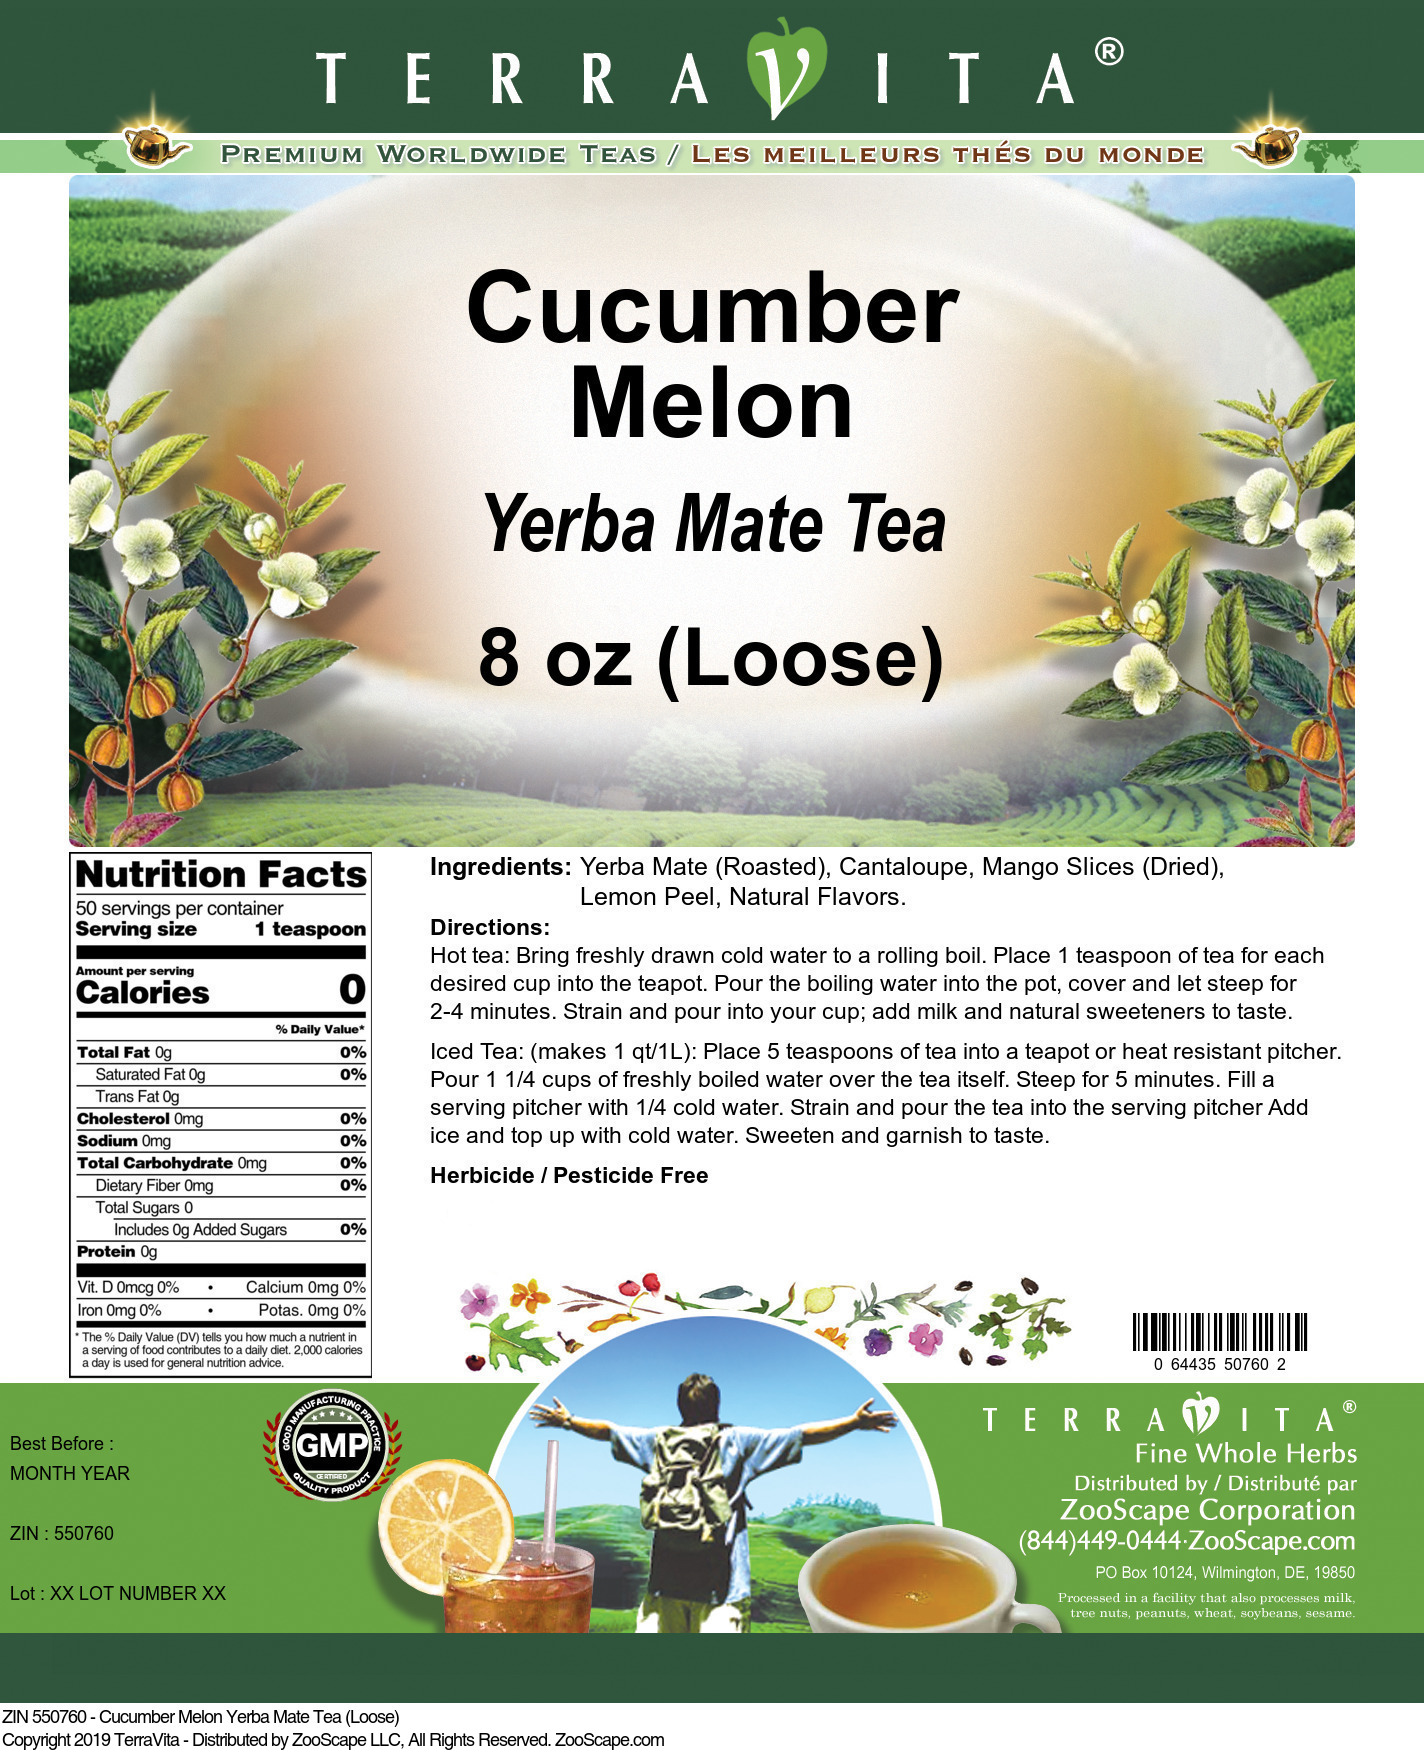 Cucumber Melon Yerba Mate Tea (Loose)